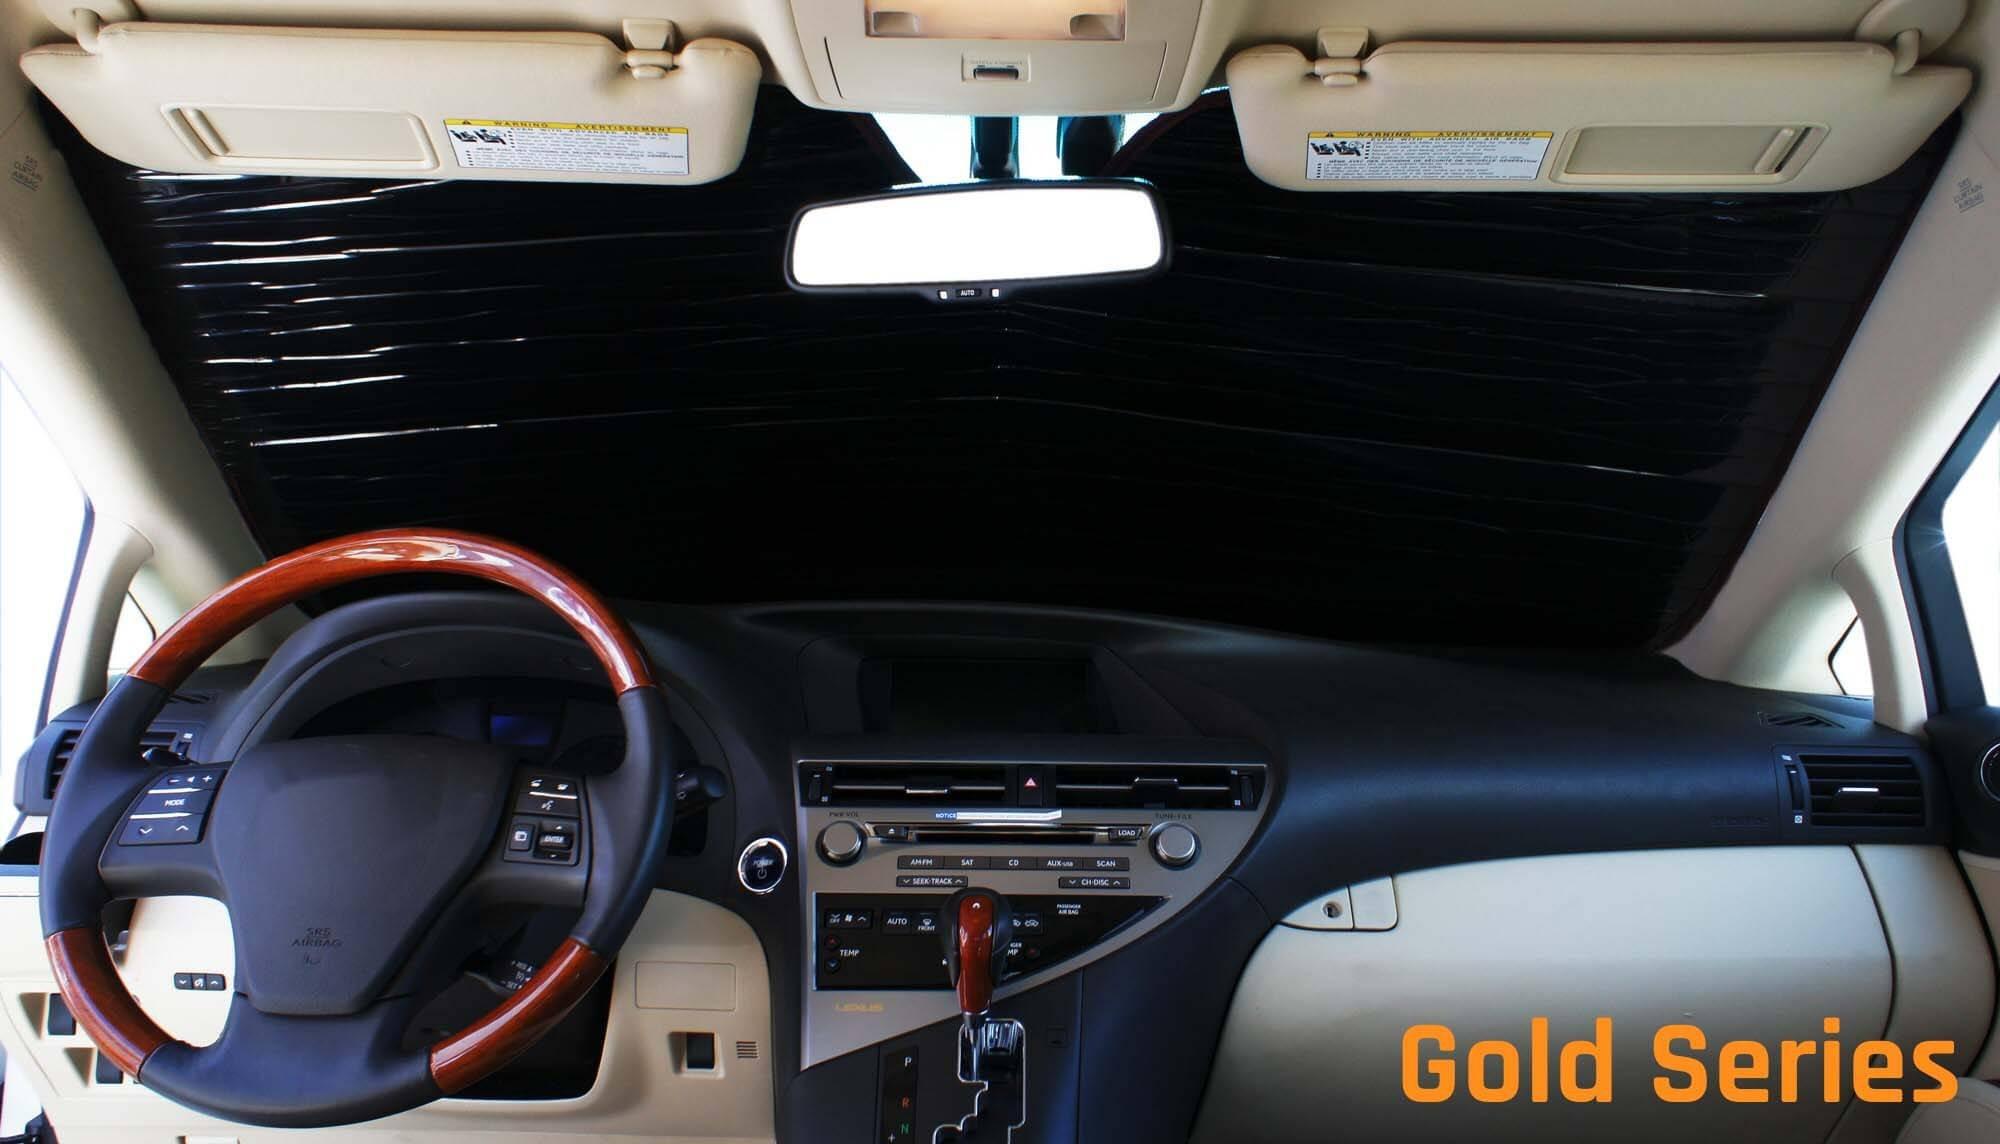 Laminate Material 1 Pack Covercraft UV11426BL Blue Metallic UVS 100 Custom Fit Sunscreen for Select Toyota Tacoma Models